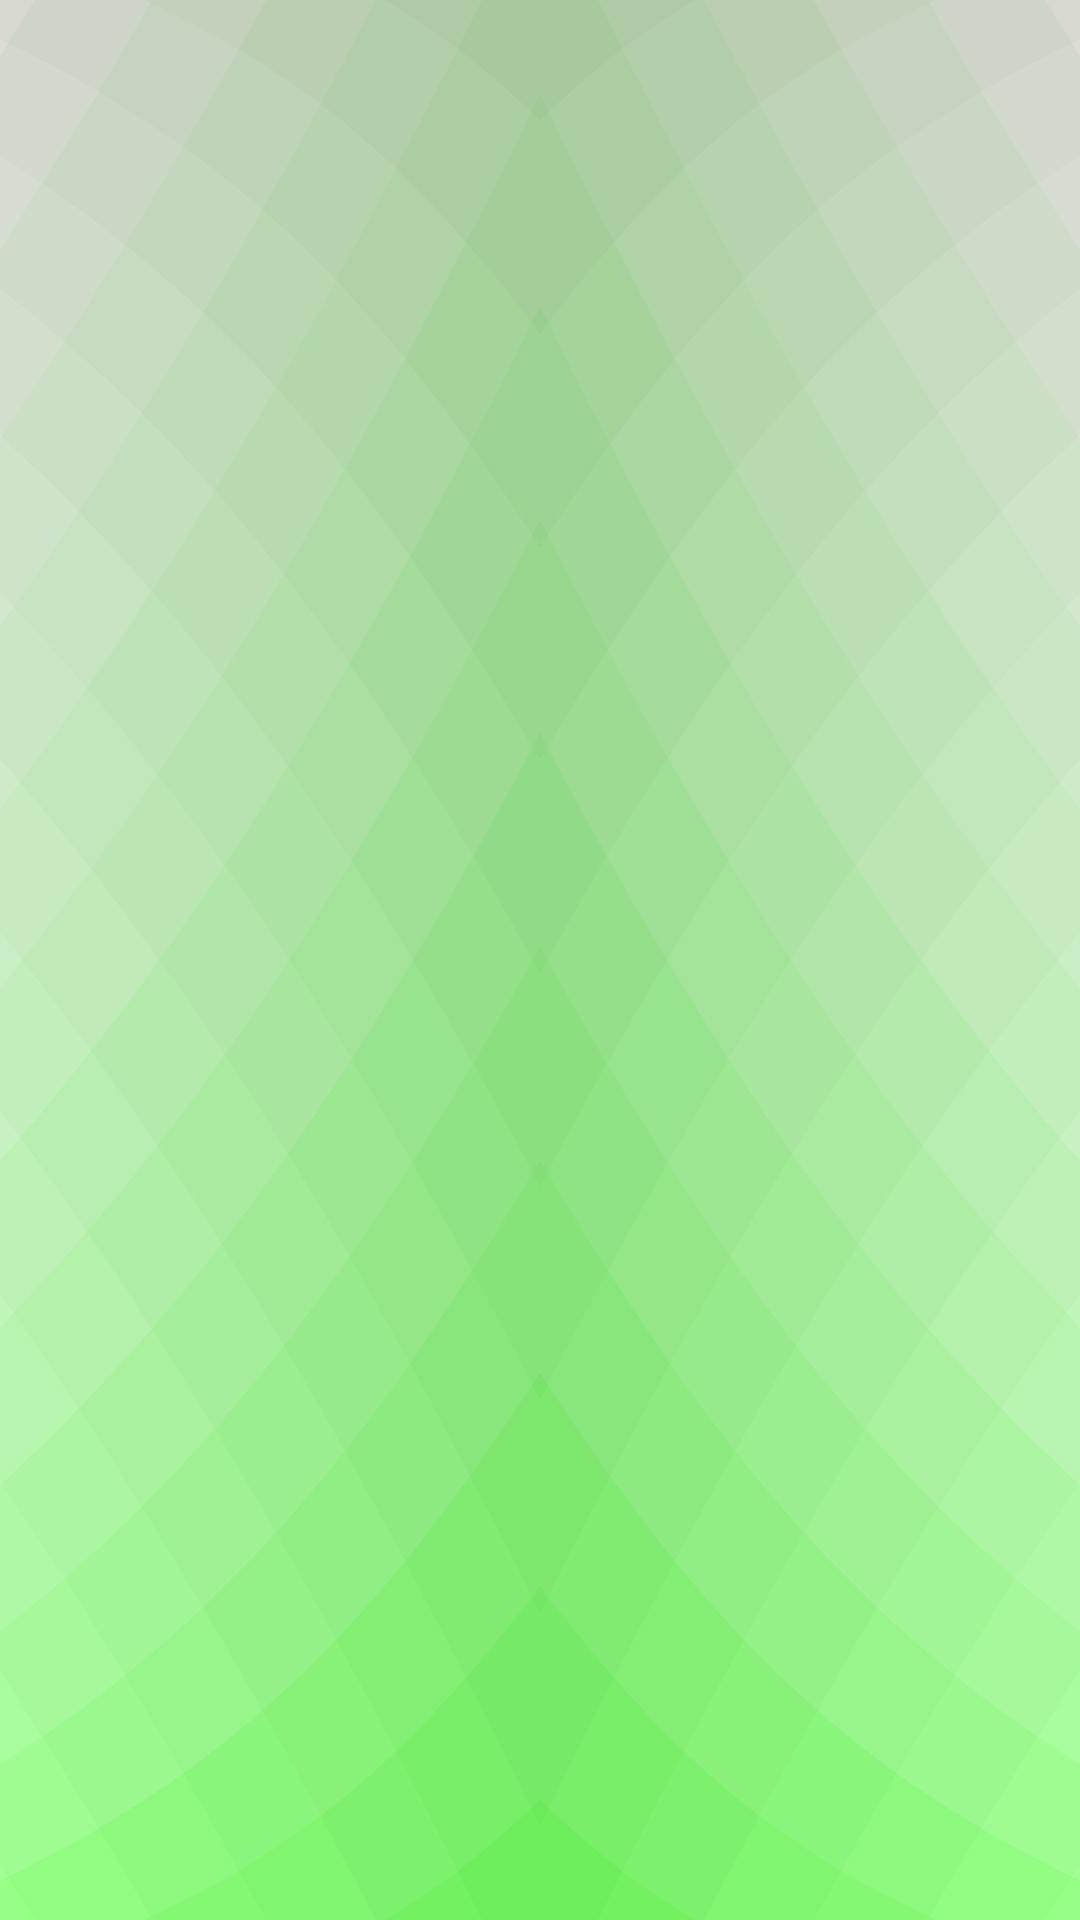 Wallpaper iphone kuning - Pola Gradasi Kuning Hijau Iphone7 Plus Wallpaper